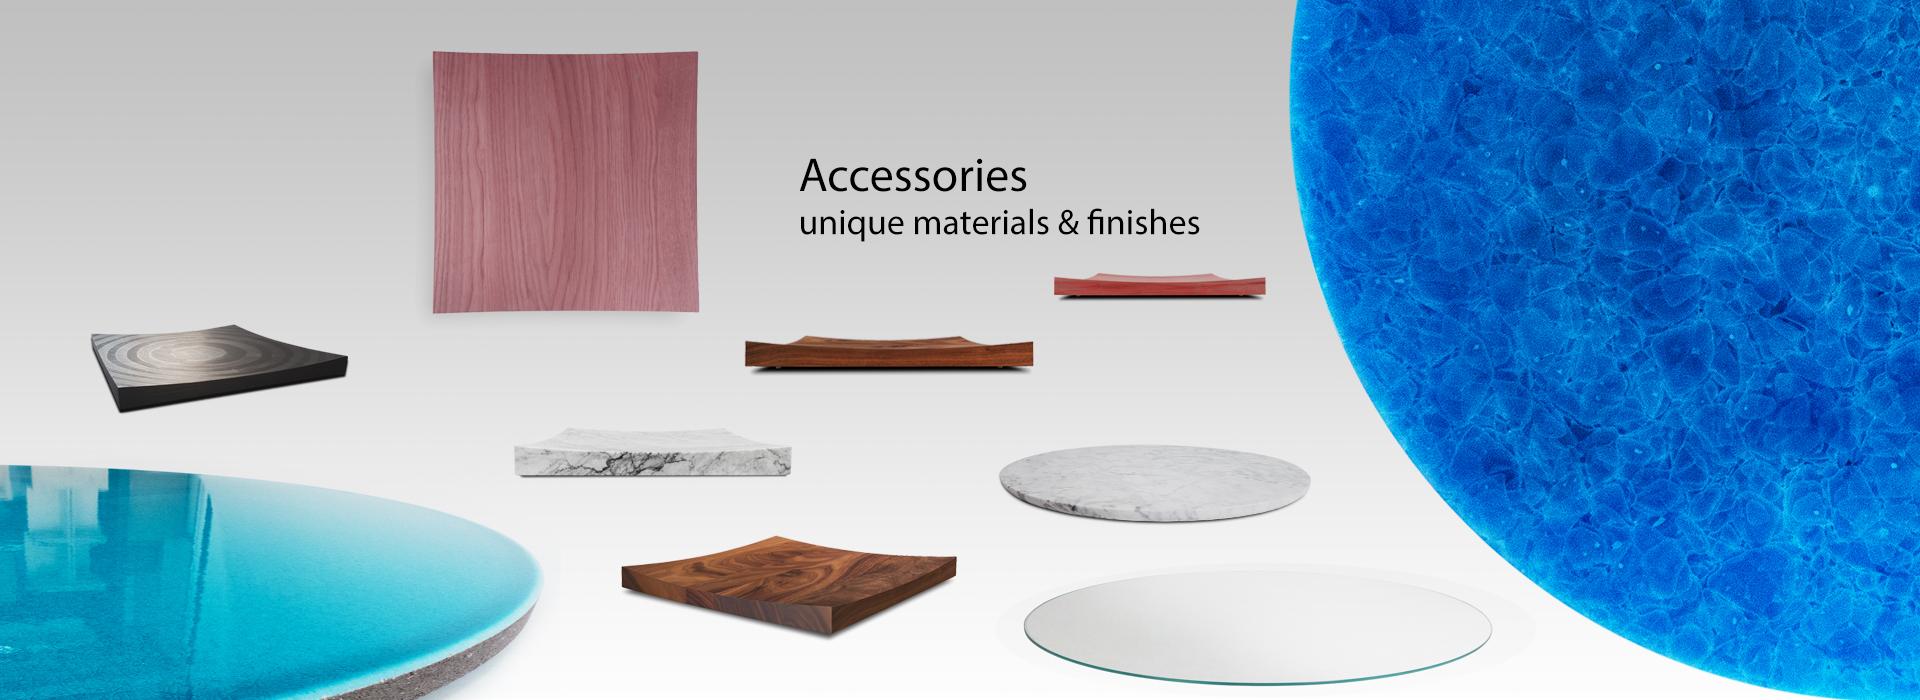 04-Accessoires-Slider-01